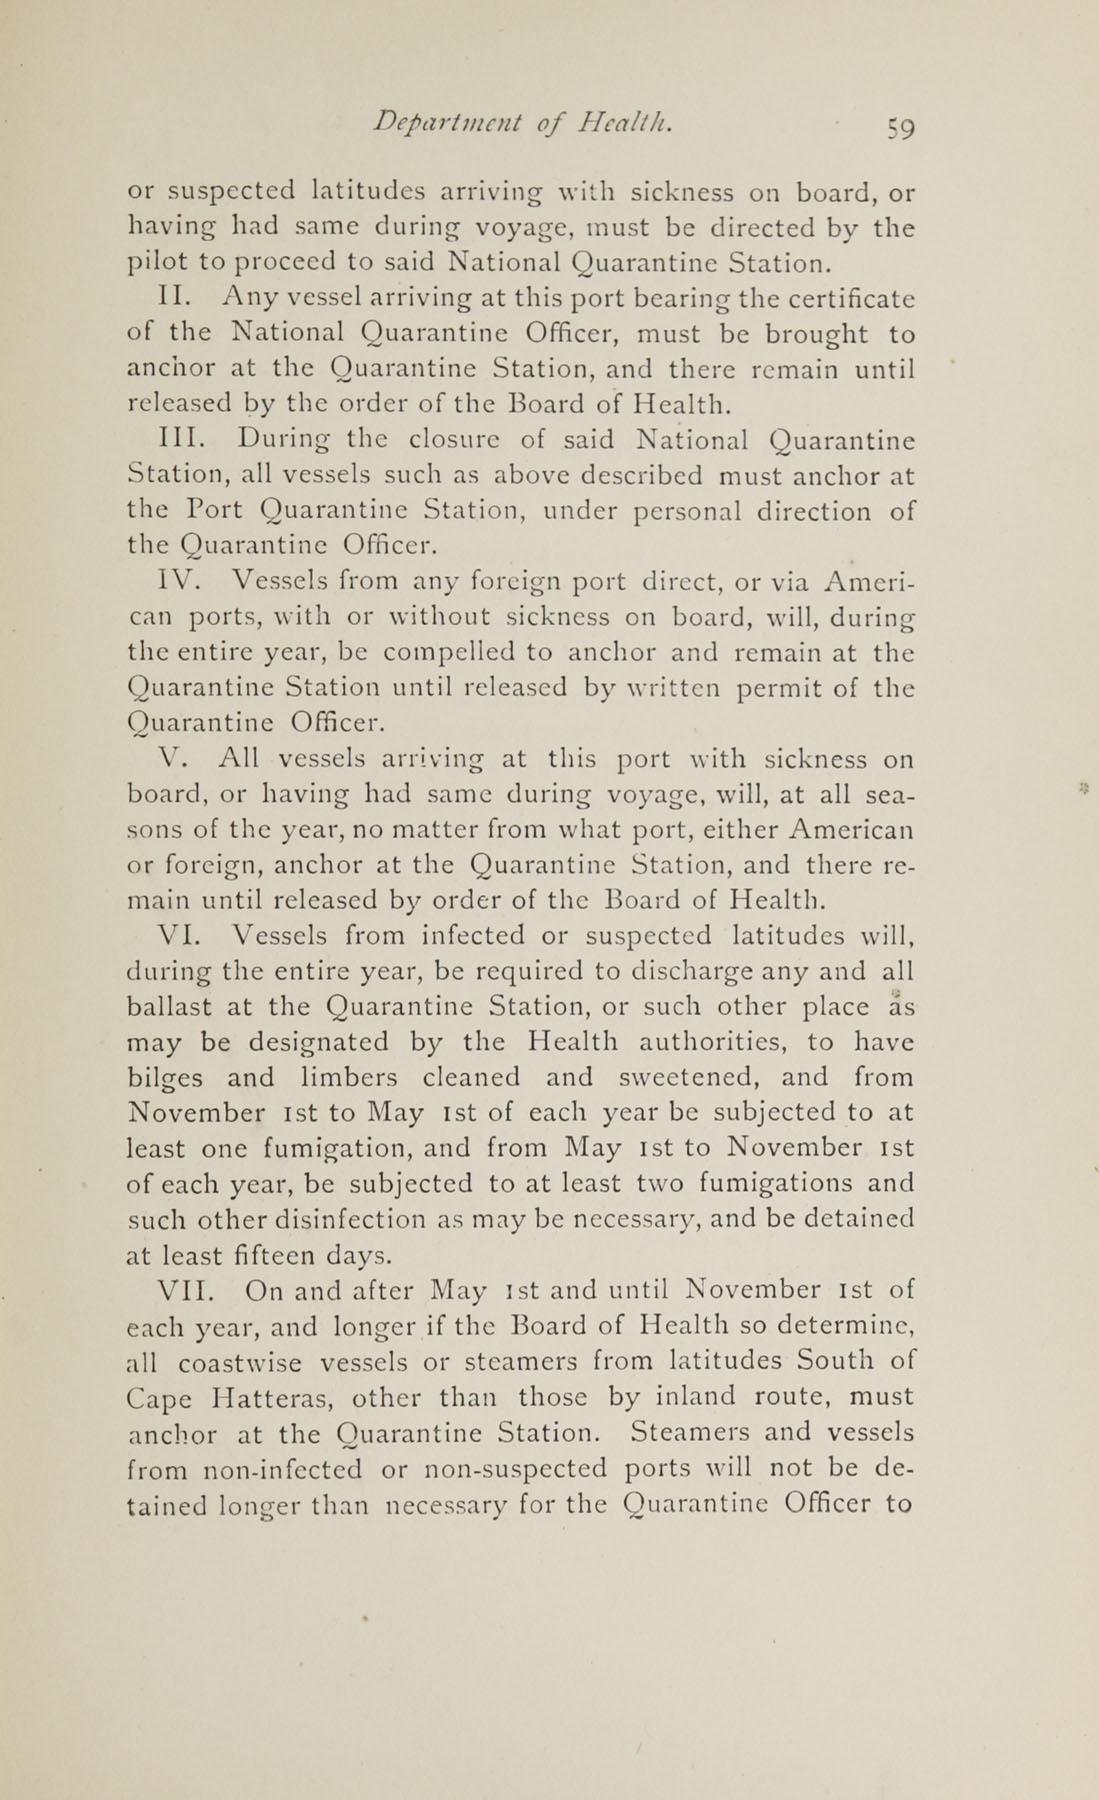 Charleston Yearbook, 1882, page 59